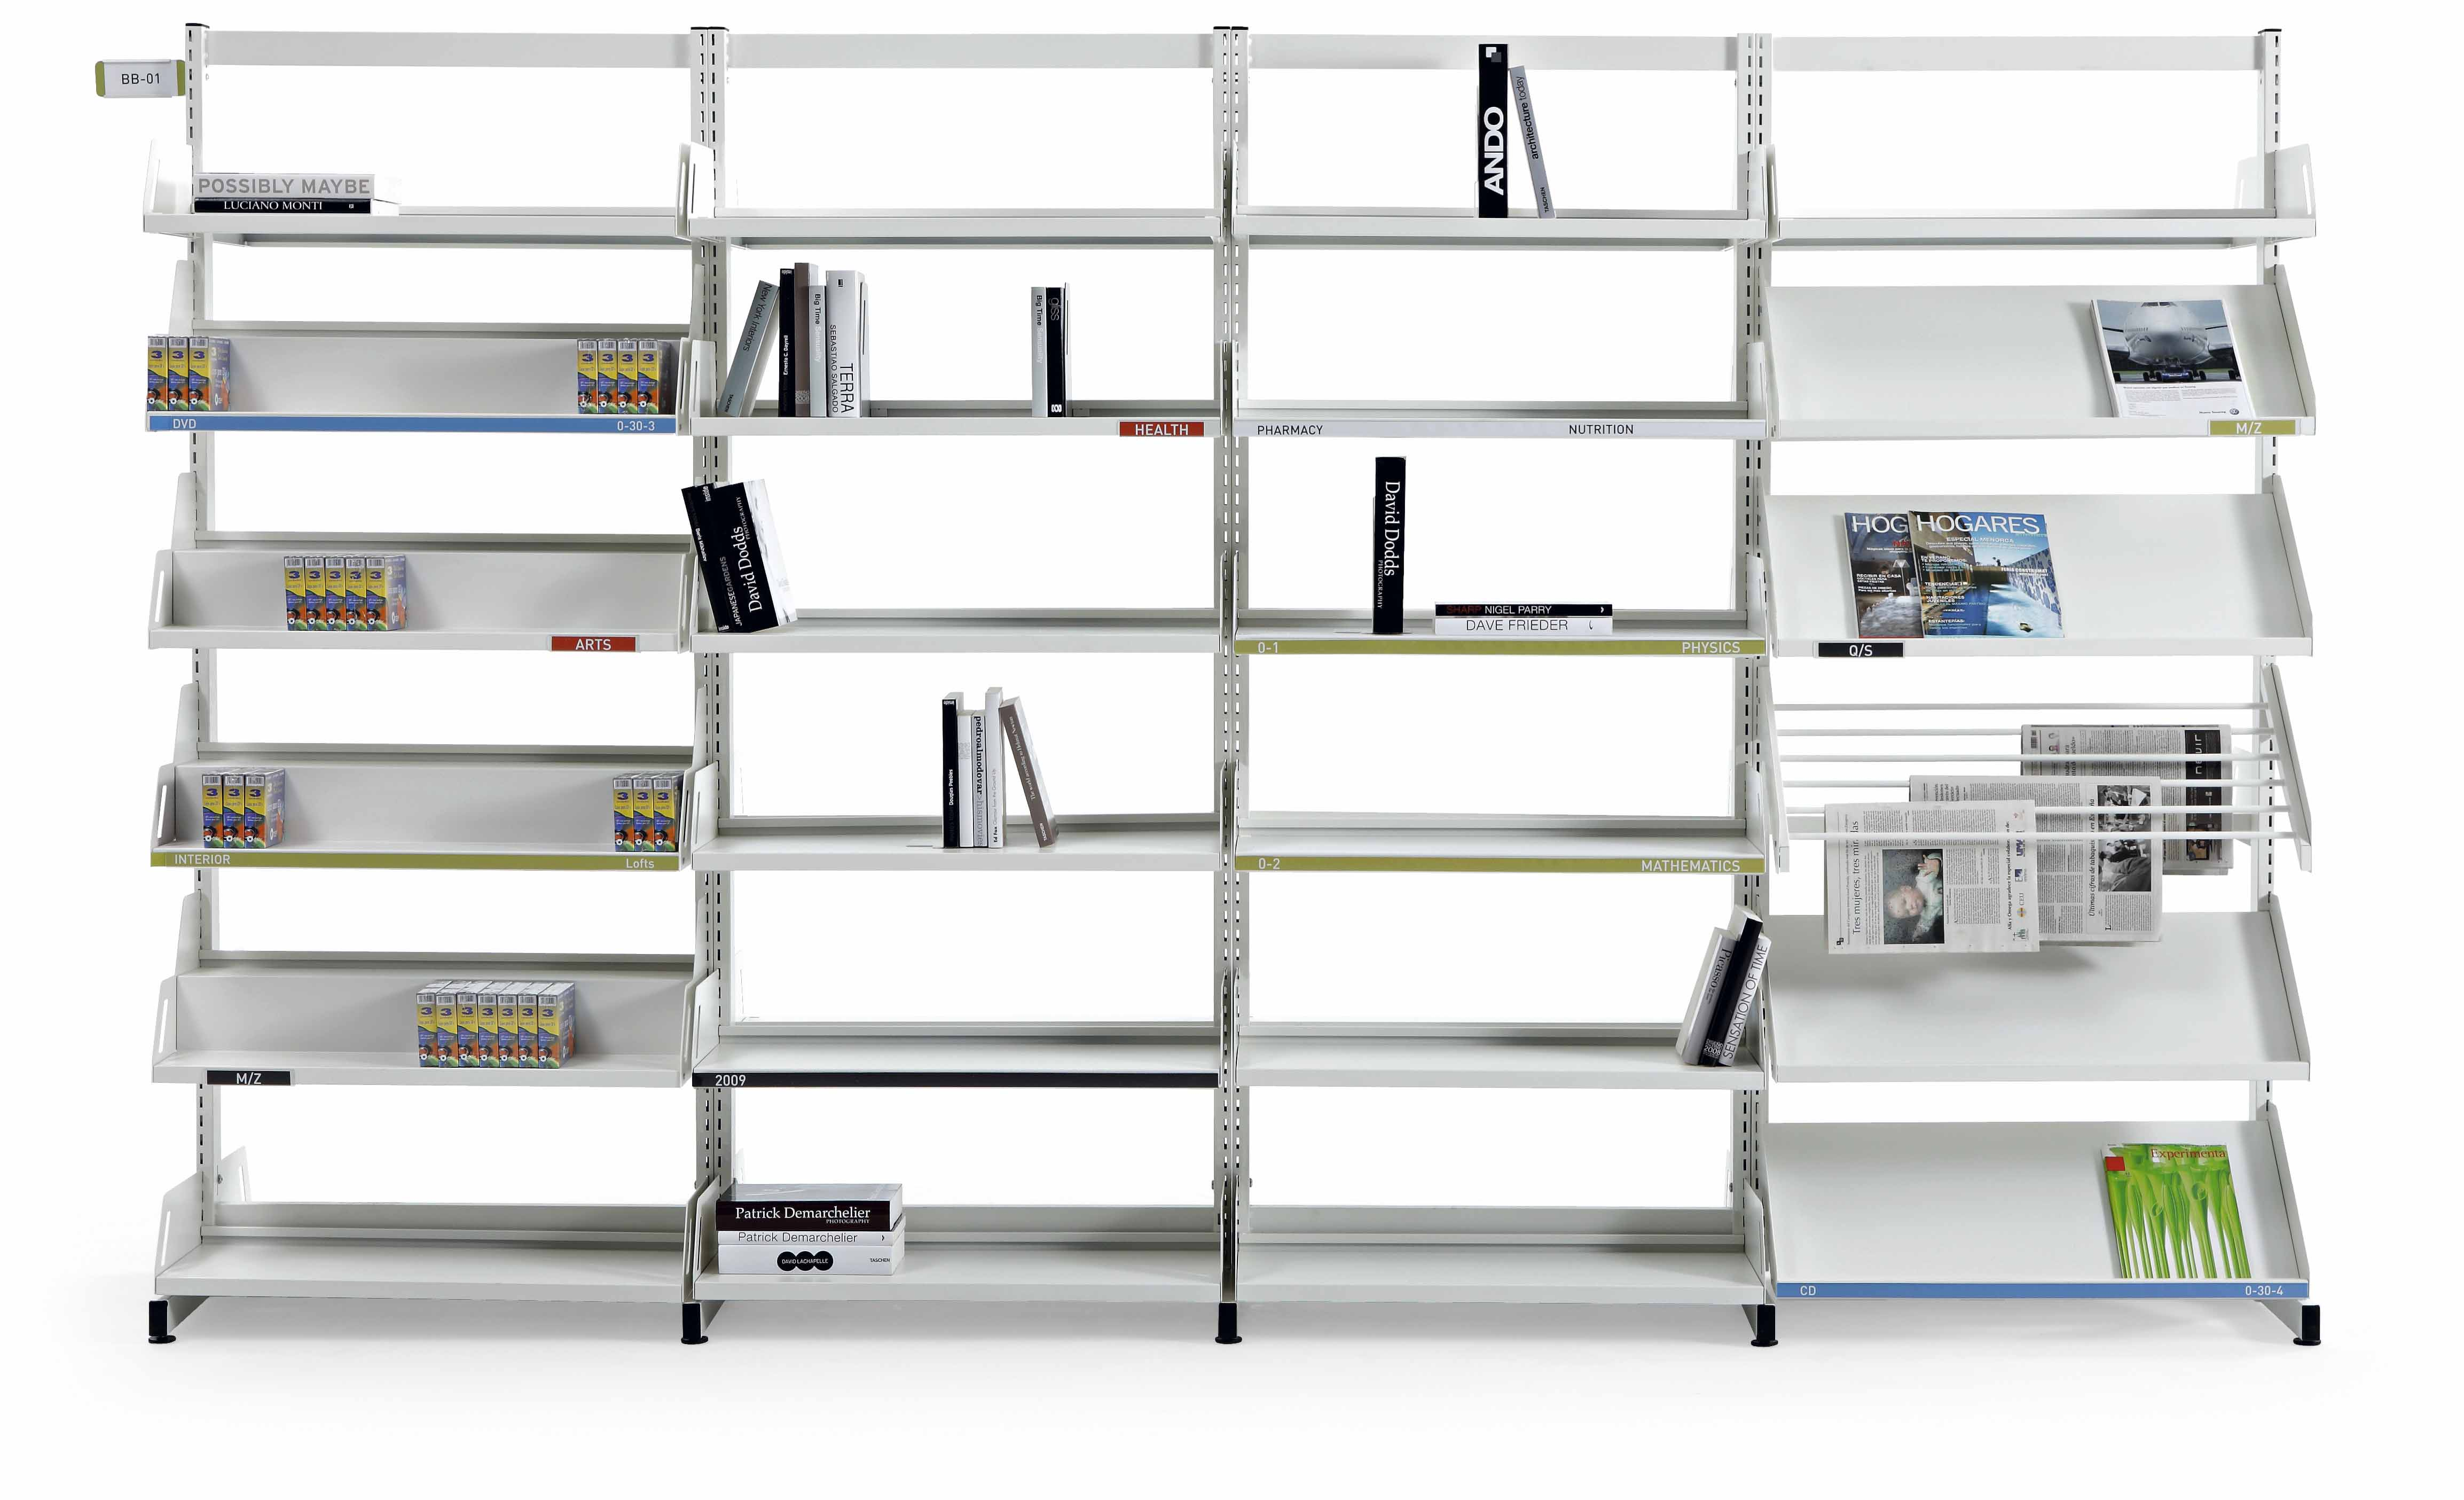 Estanterias Metalicas Jaen.Estanterias Metalicas Level Muebles De Oficina Spacio